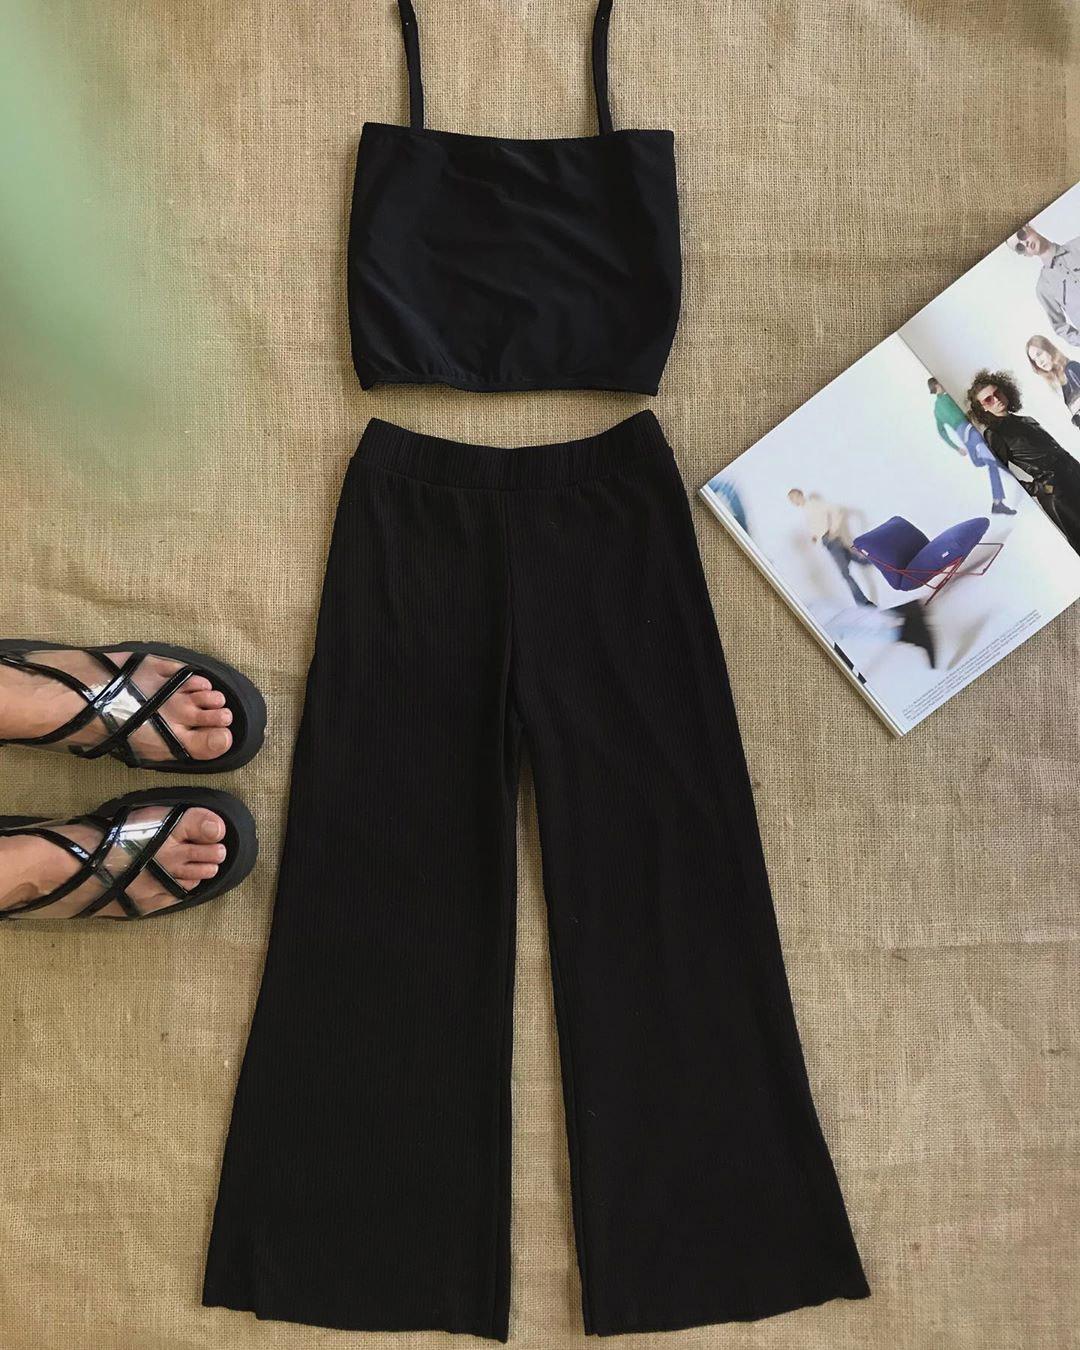 Top y pantalon palazzo moda mujer verano 2020.